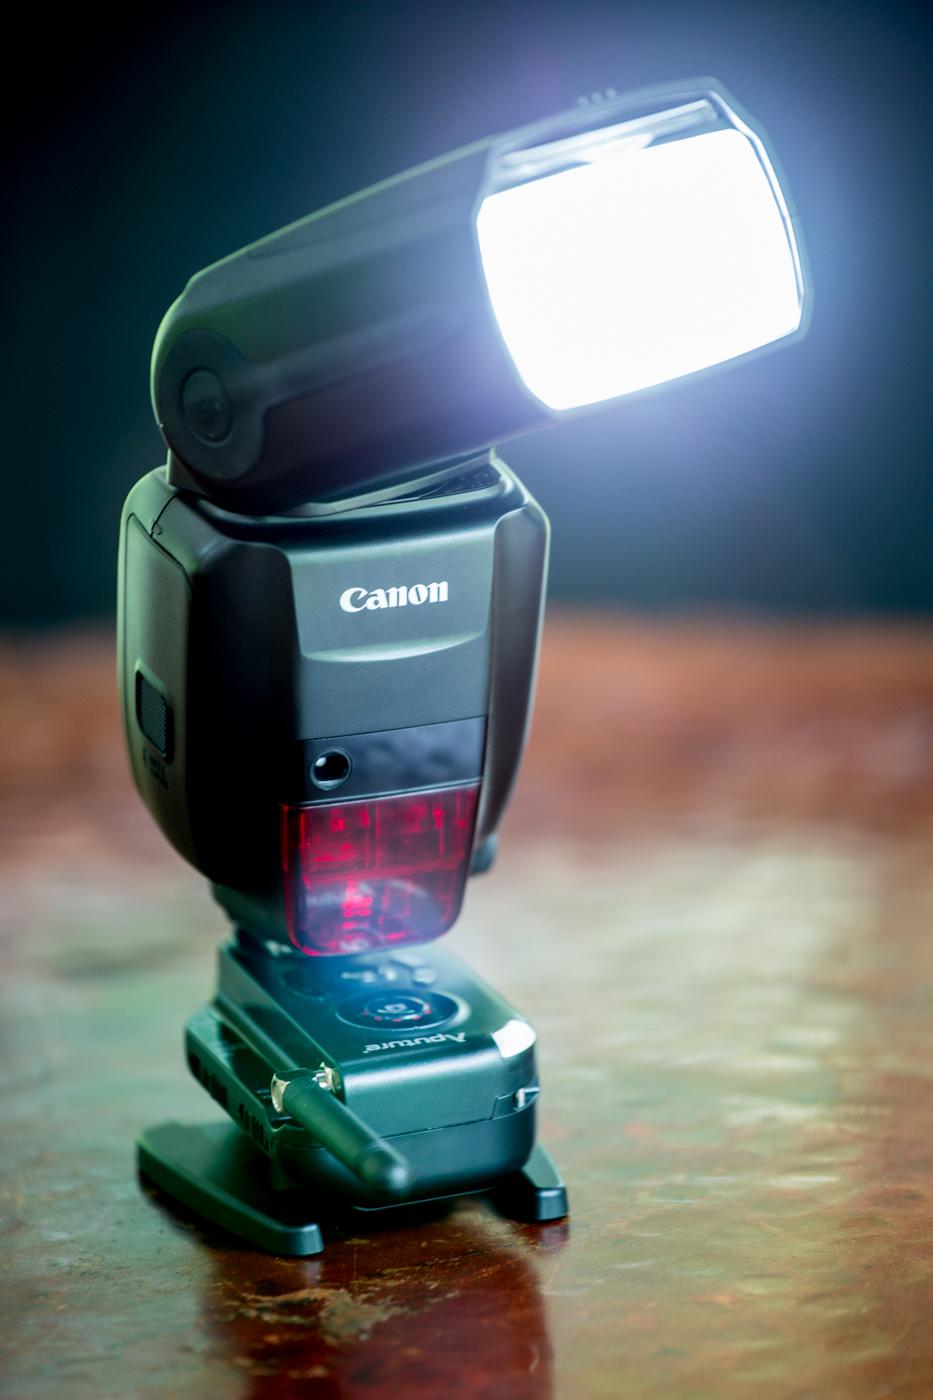 Canon's new flagship speedlite, the 600ex-rt